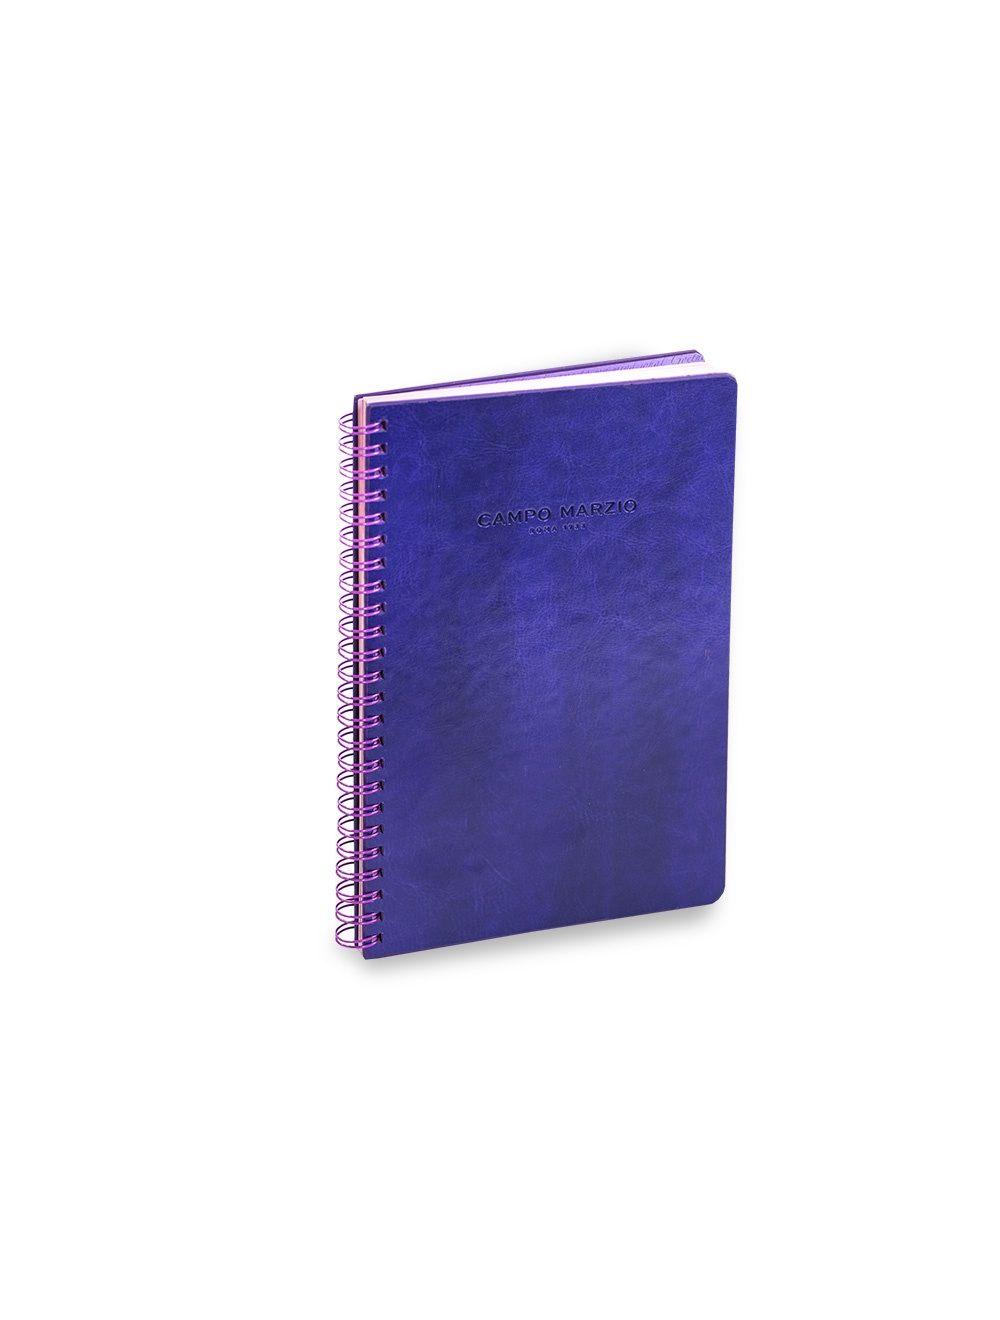 Spiral Bound Notes A5 - Violet